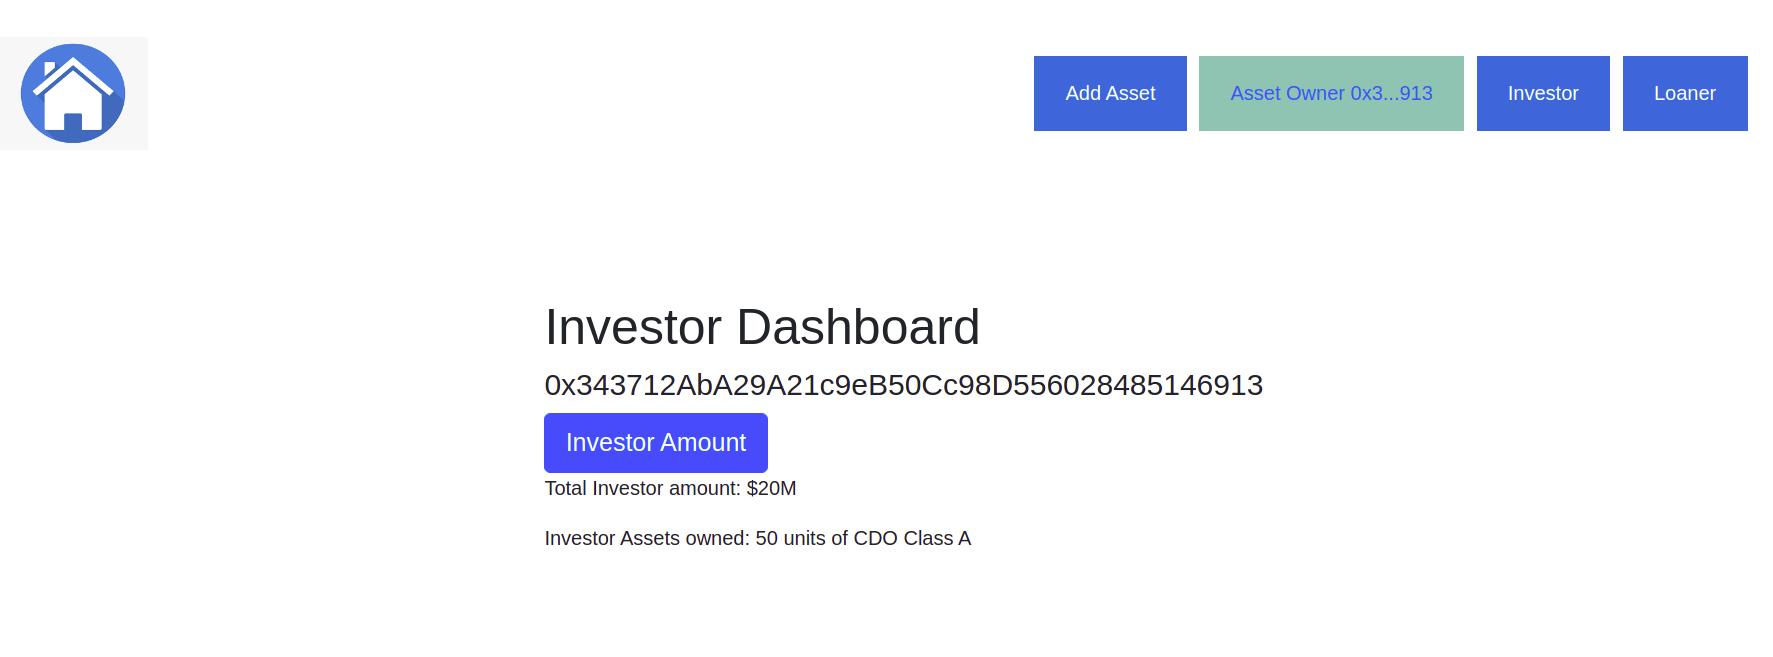 https://ethglobal.s3.amazonaws.com/recoBzad48VreDVmi/investor.png